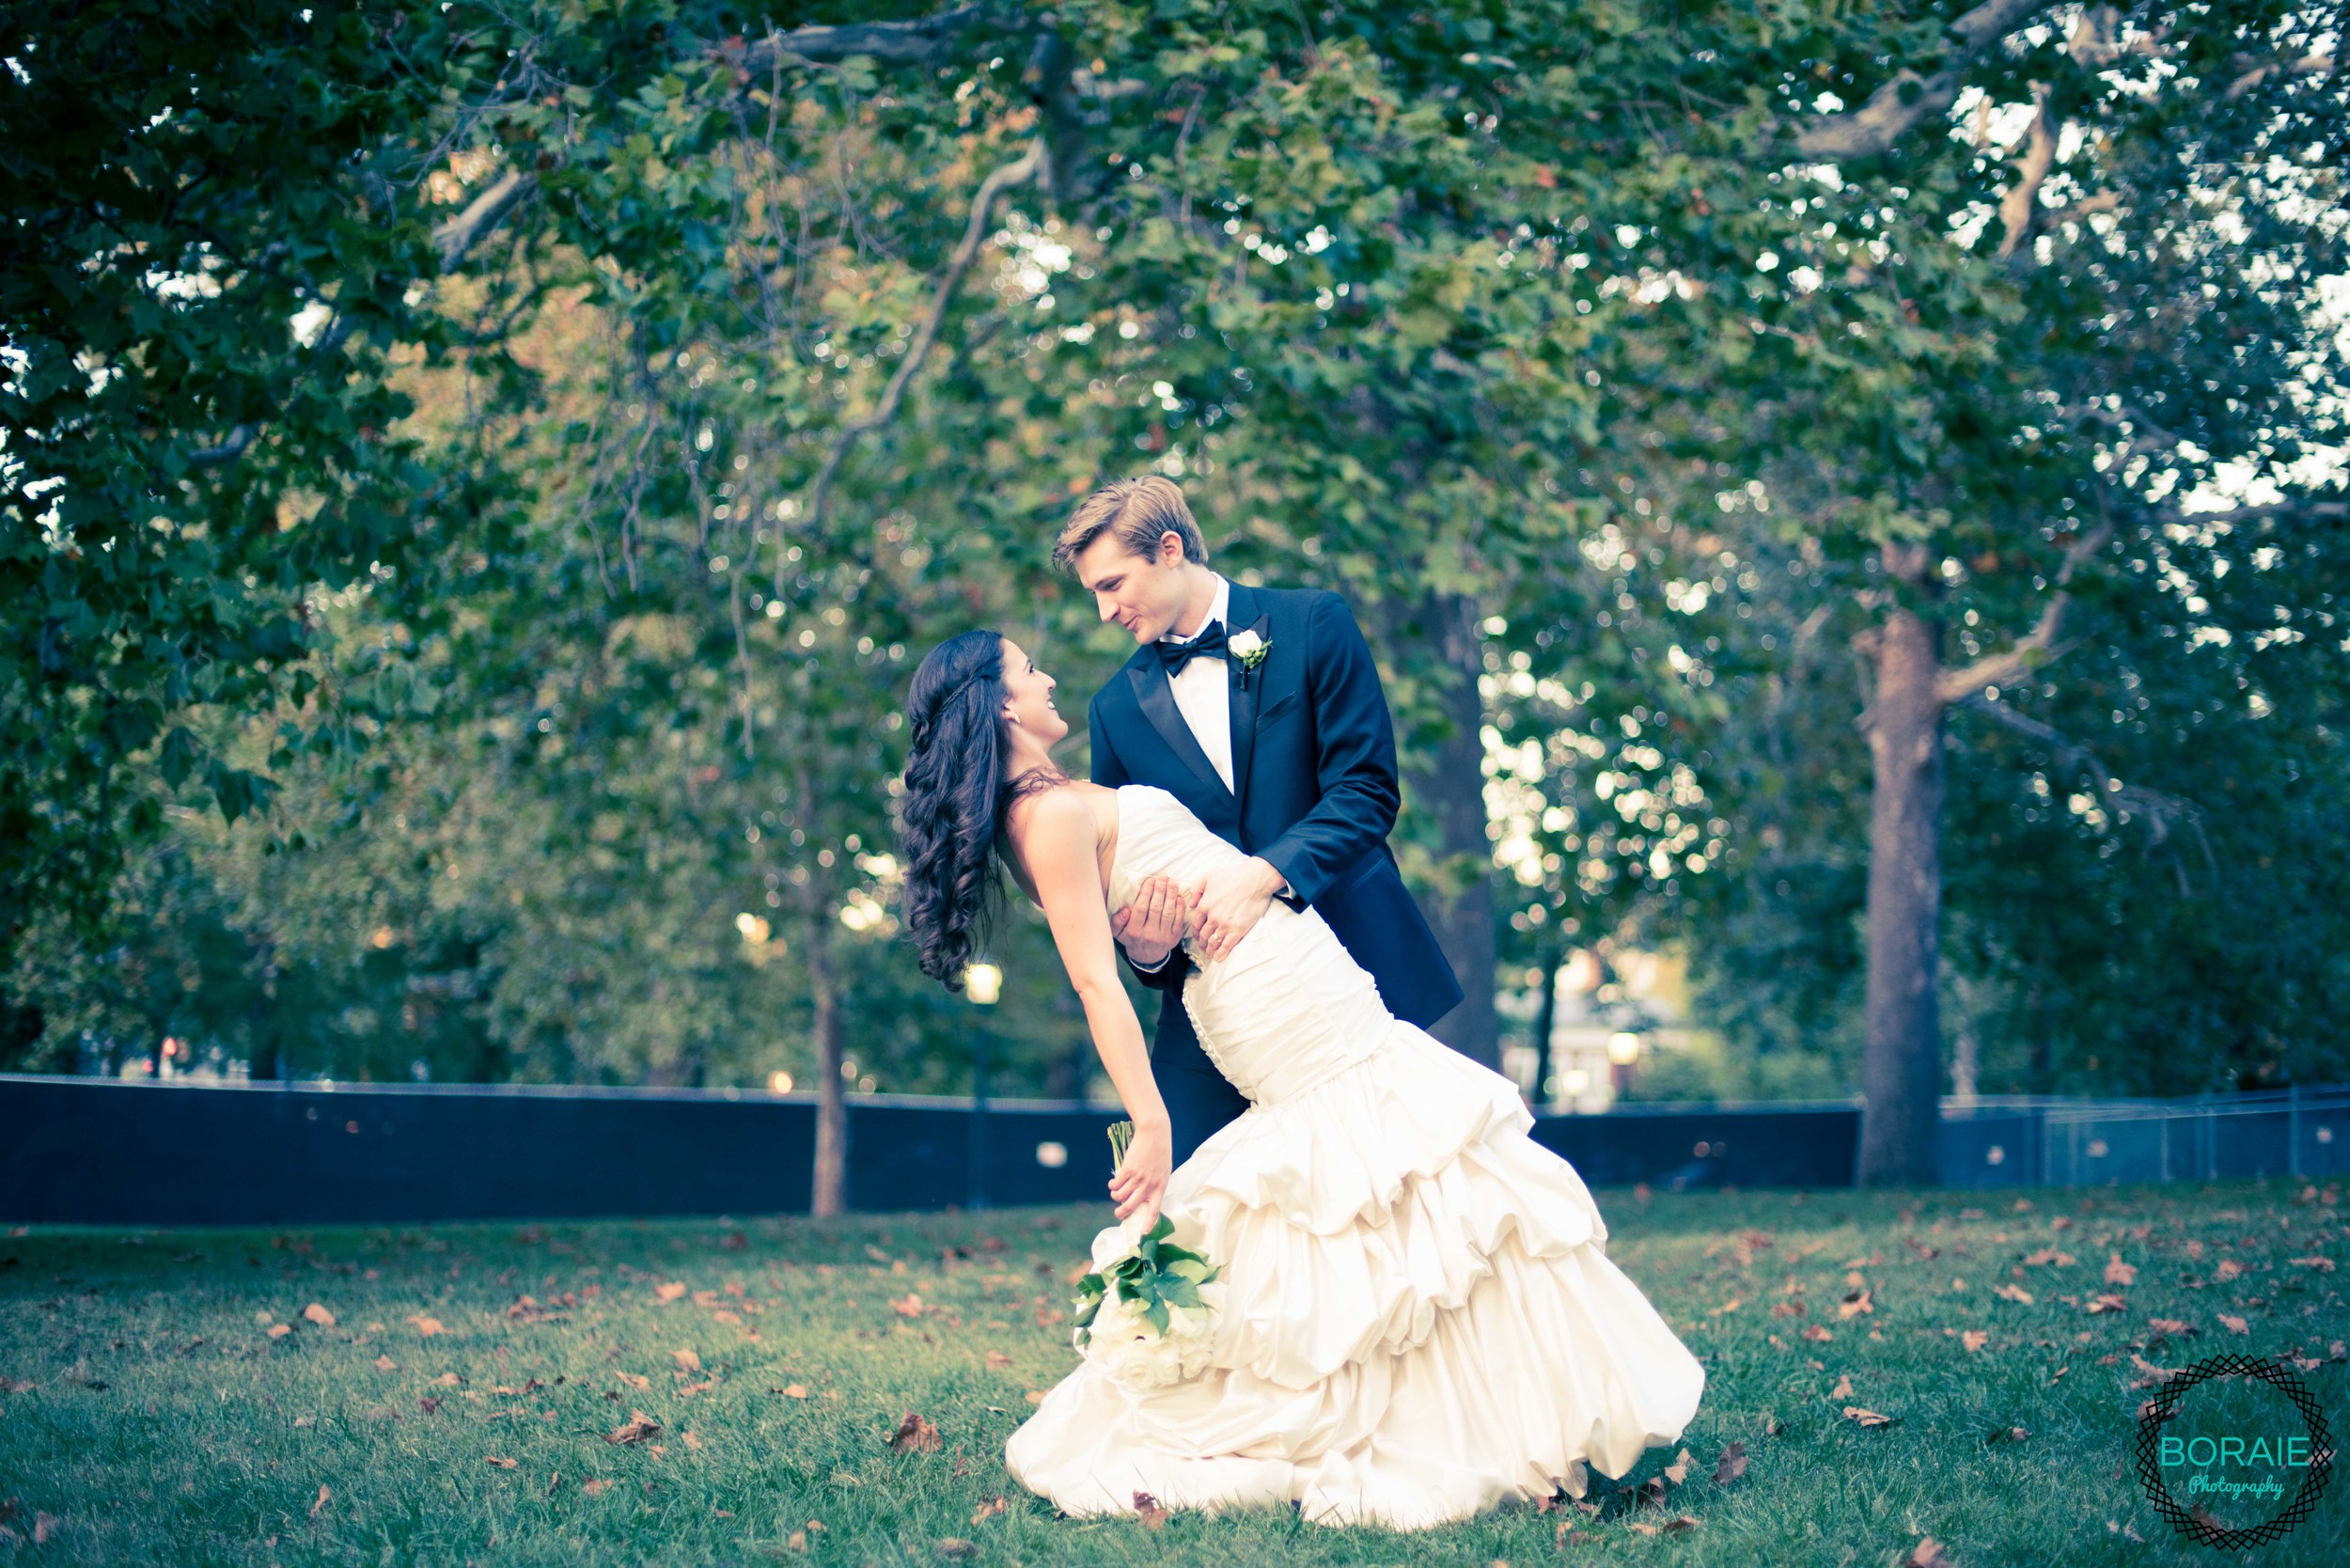 Kaitie and Peter- Boraie Photography-9.jpg